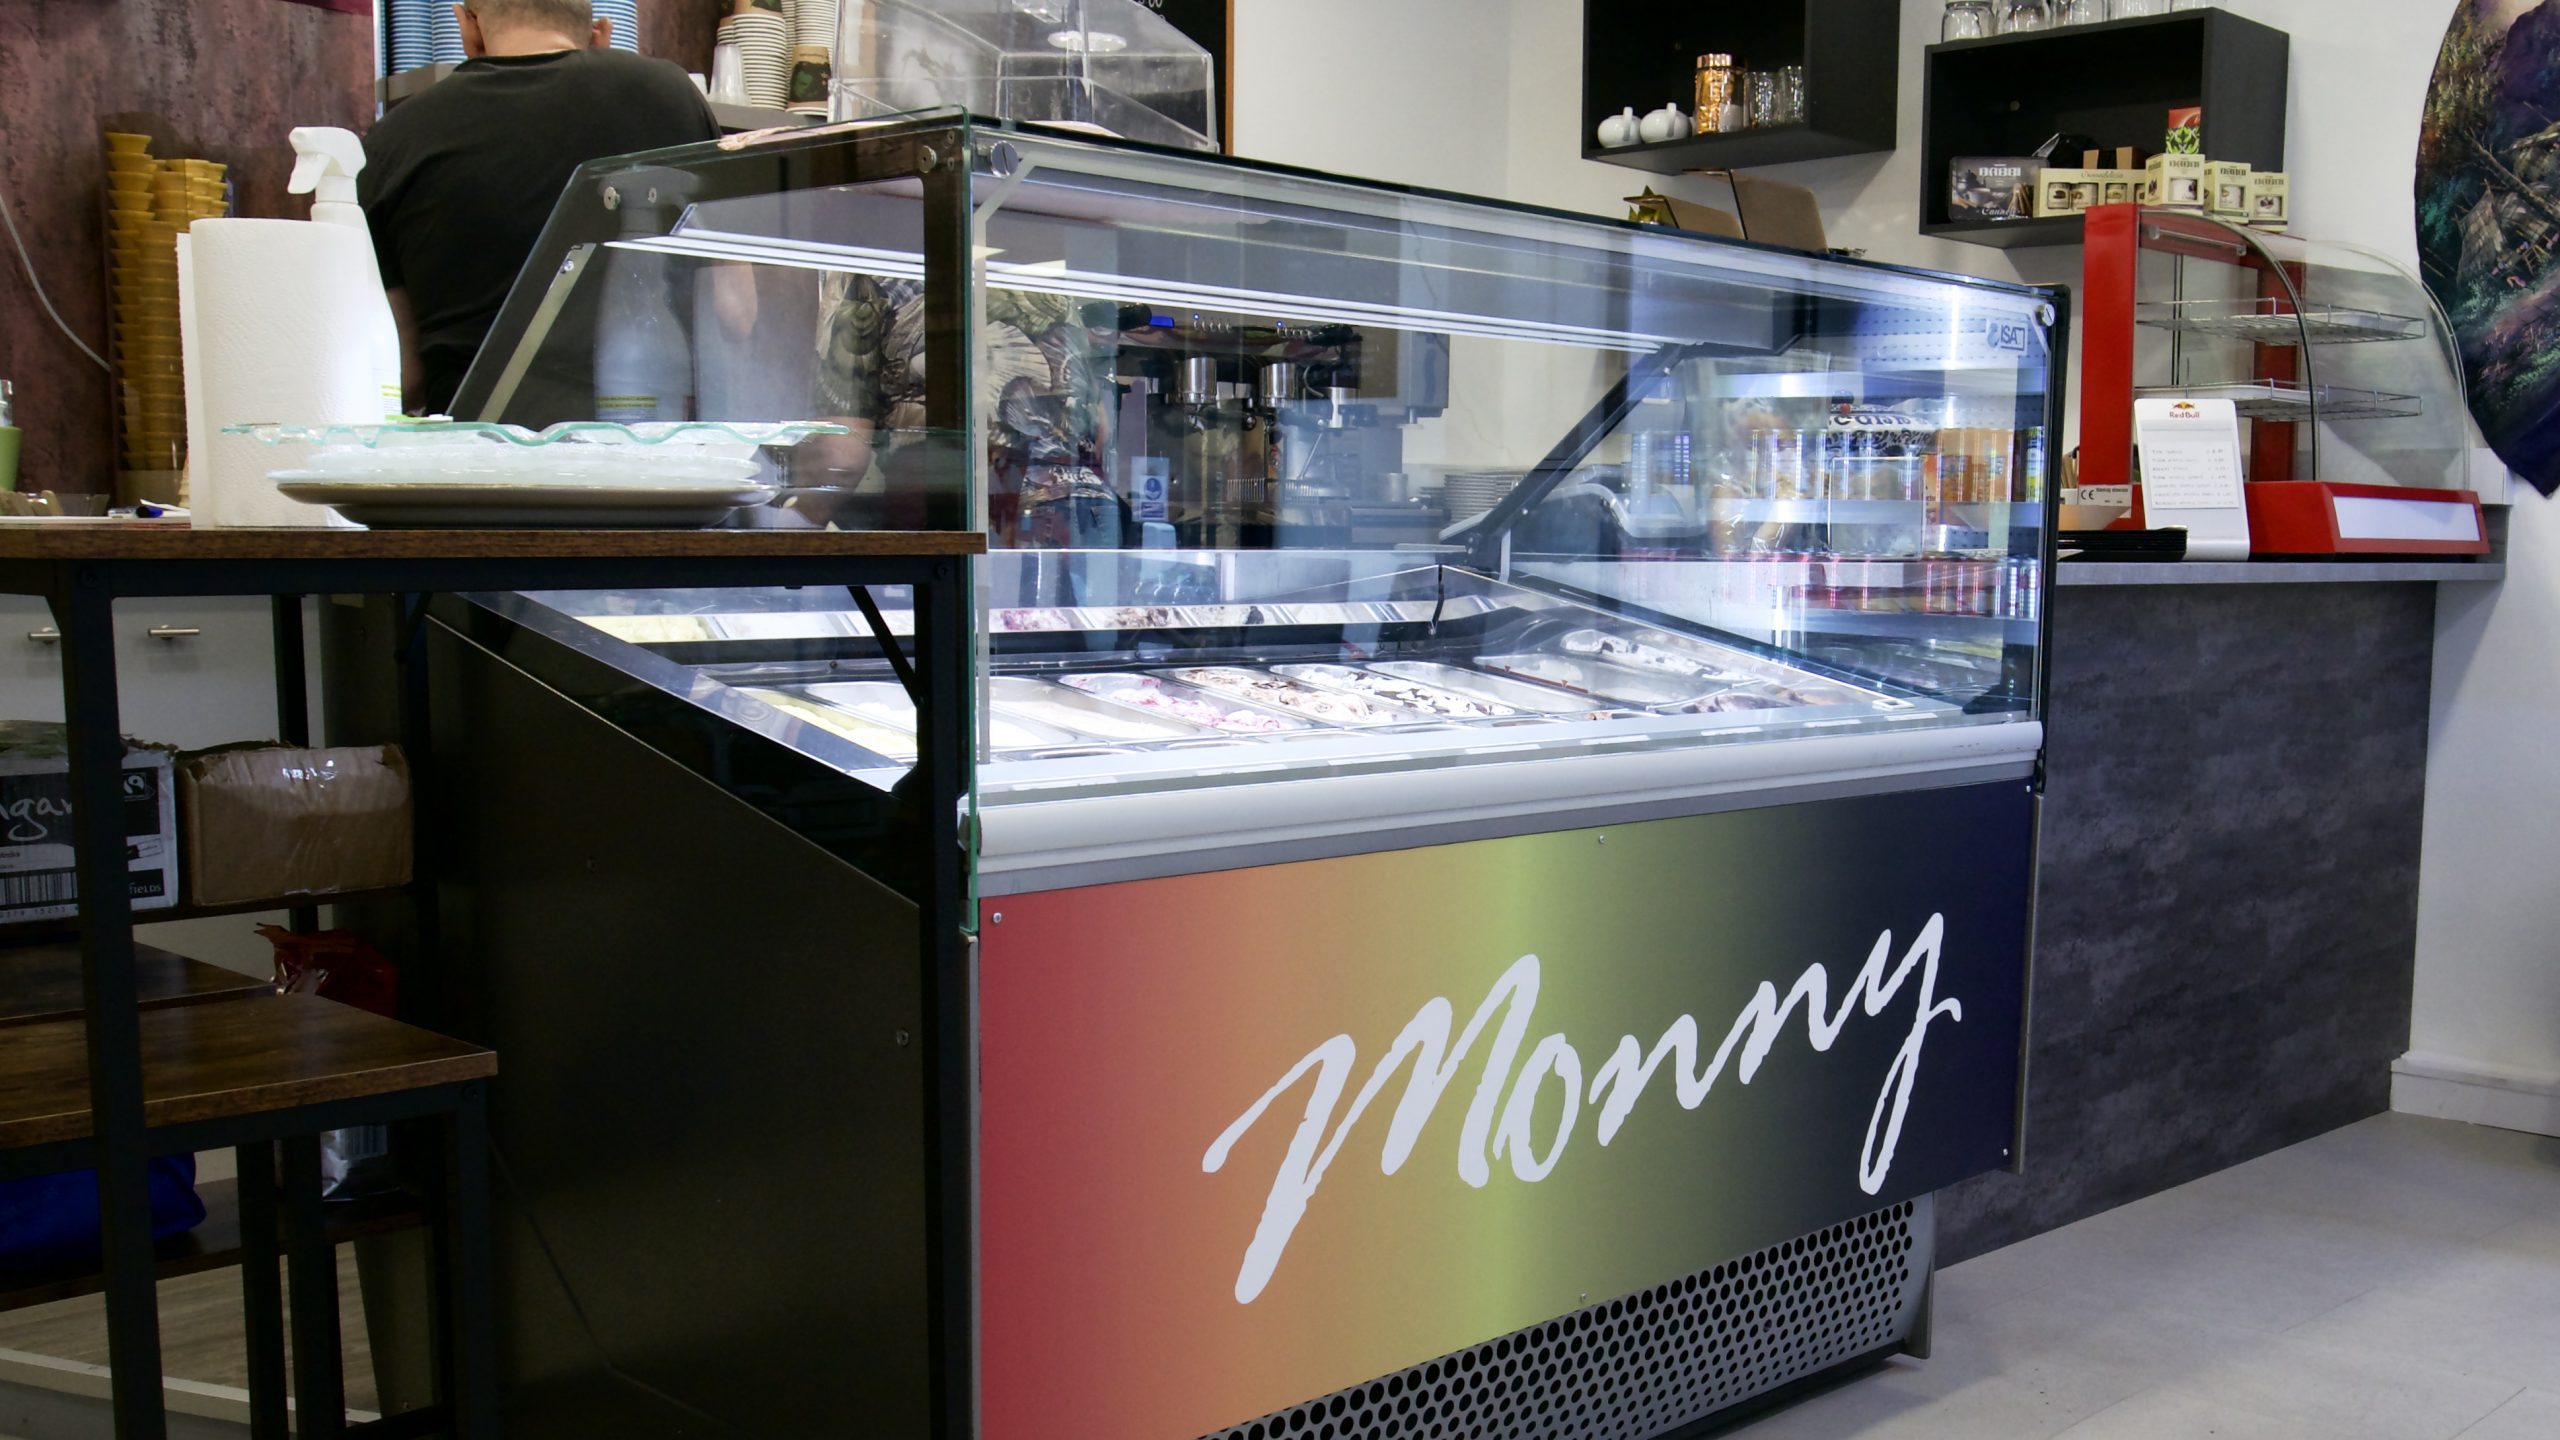 Monny ice cream Stirling